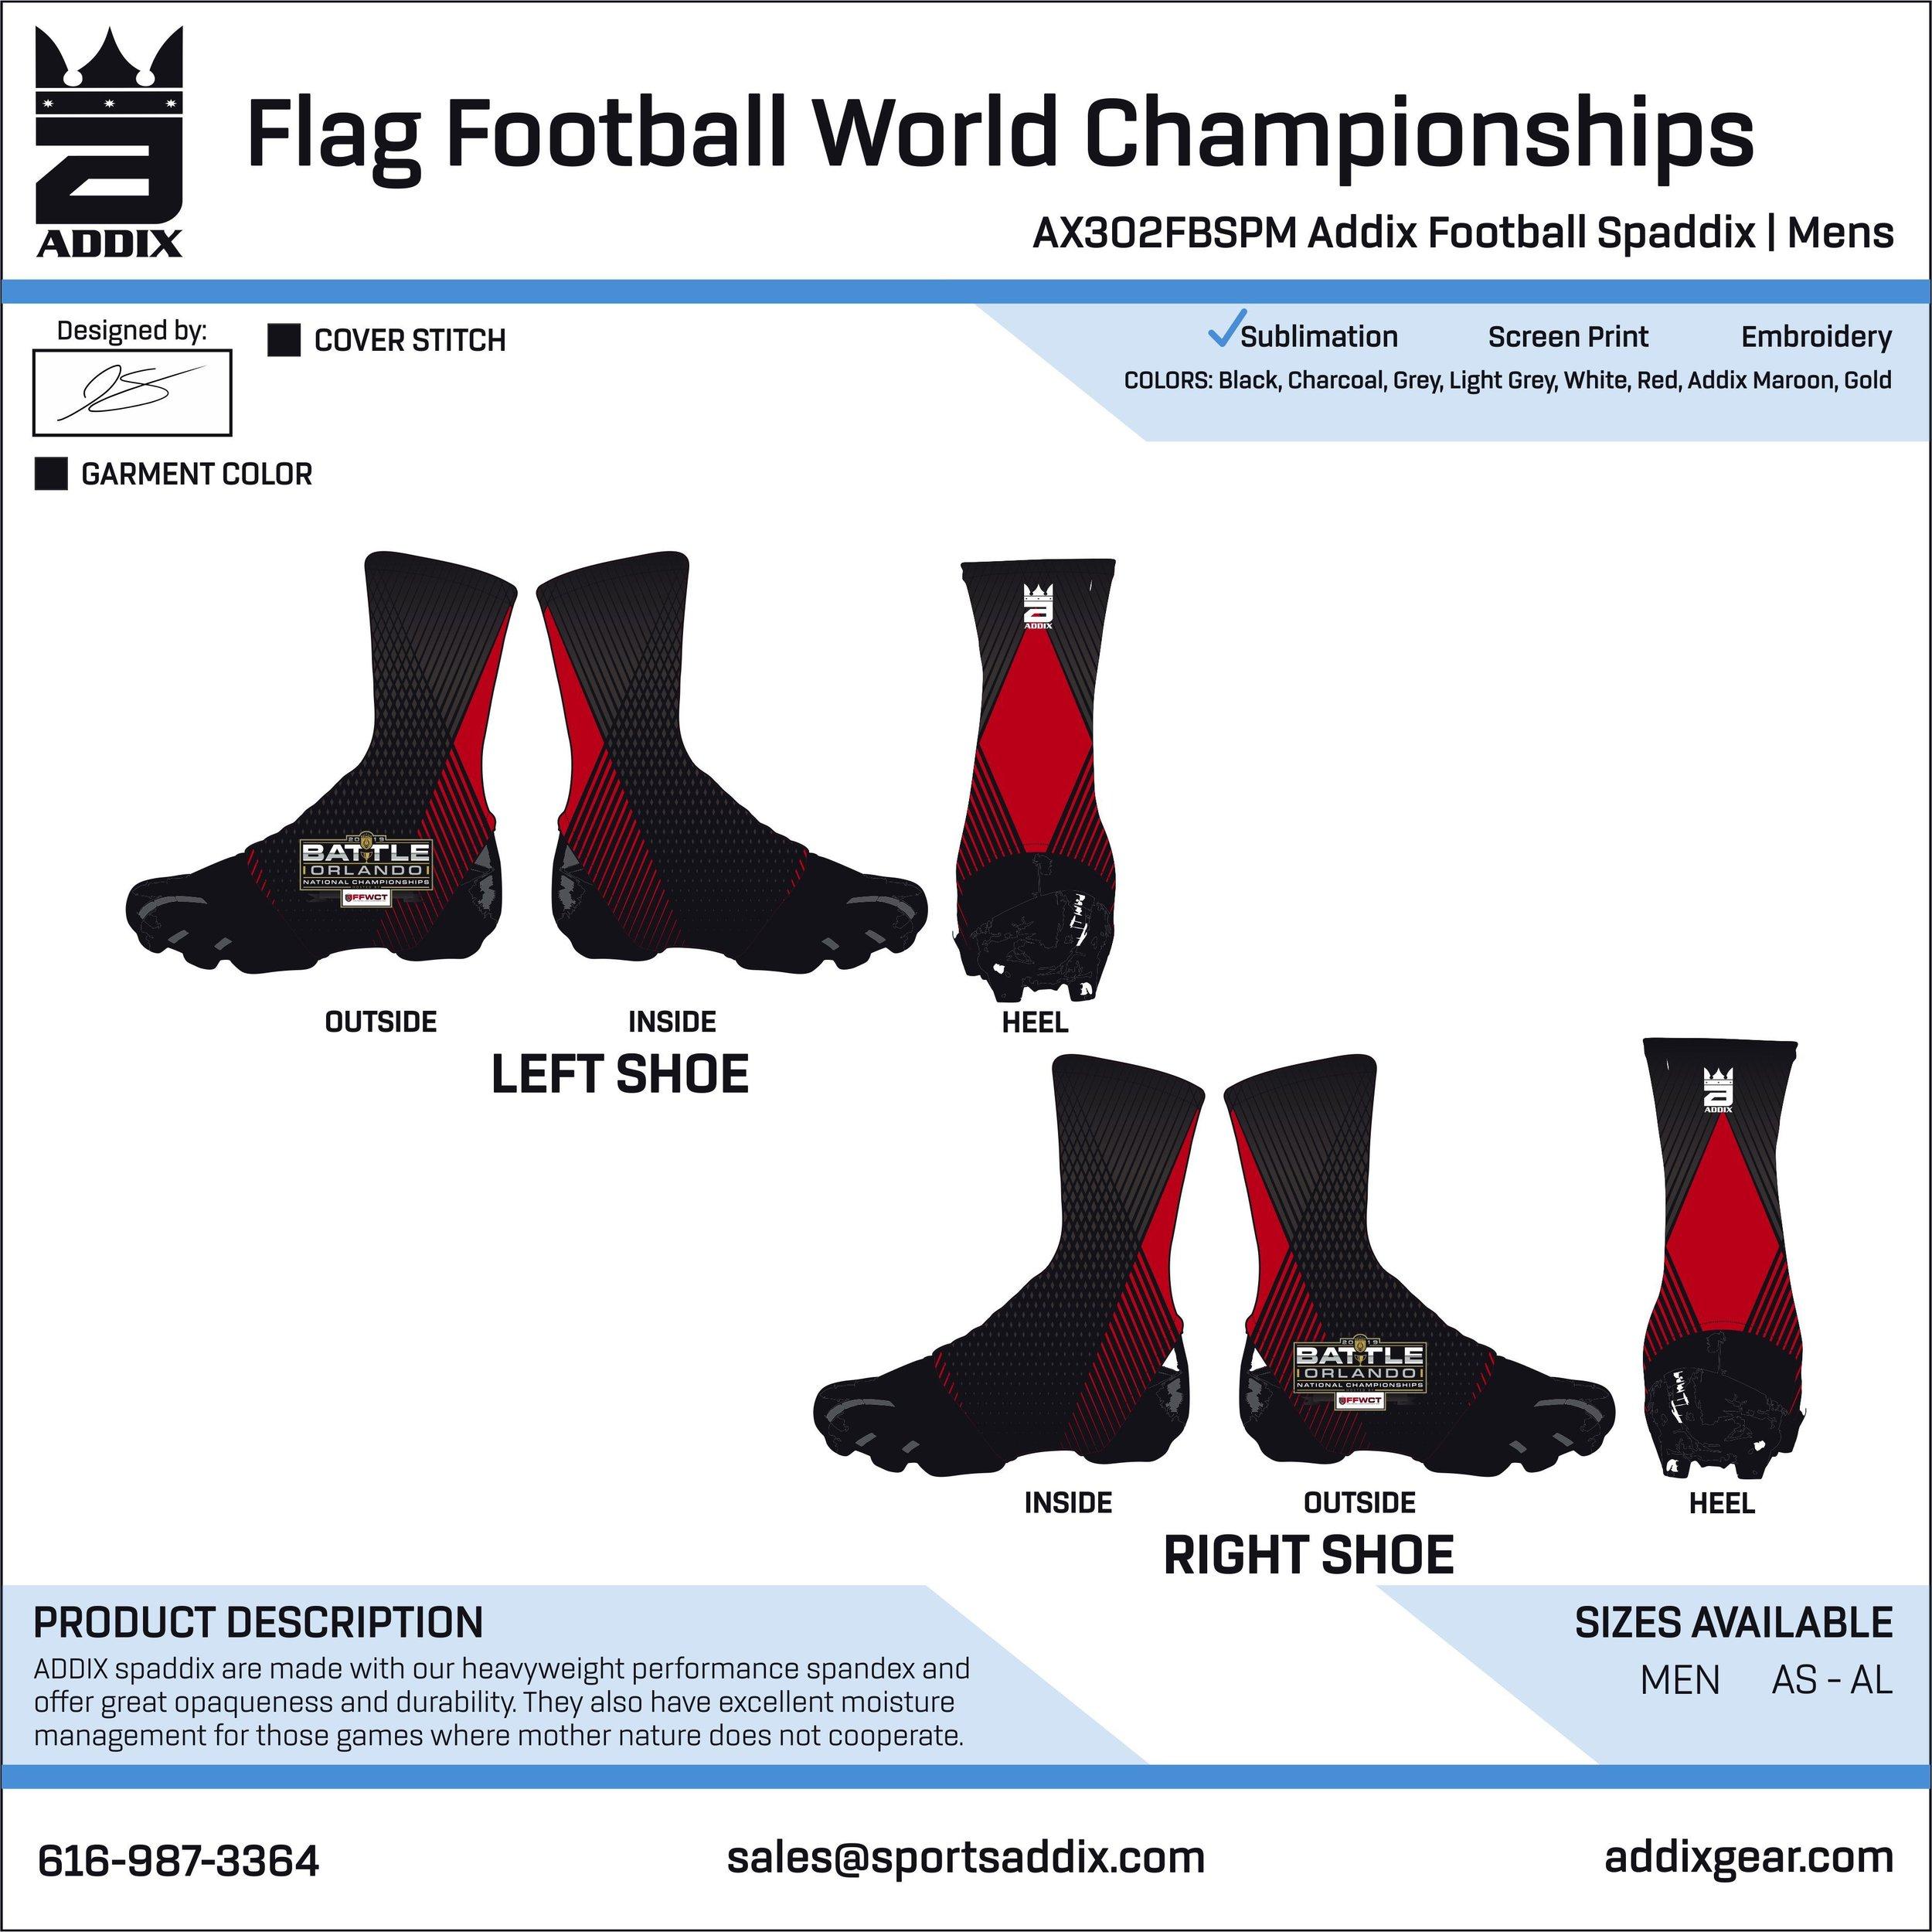 Flag Football World Championships_2018_12-28_JE_Spaddix.jpg